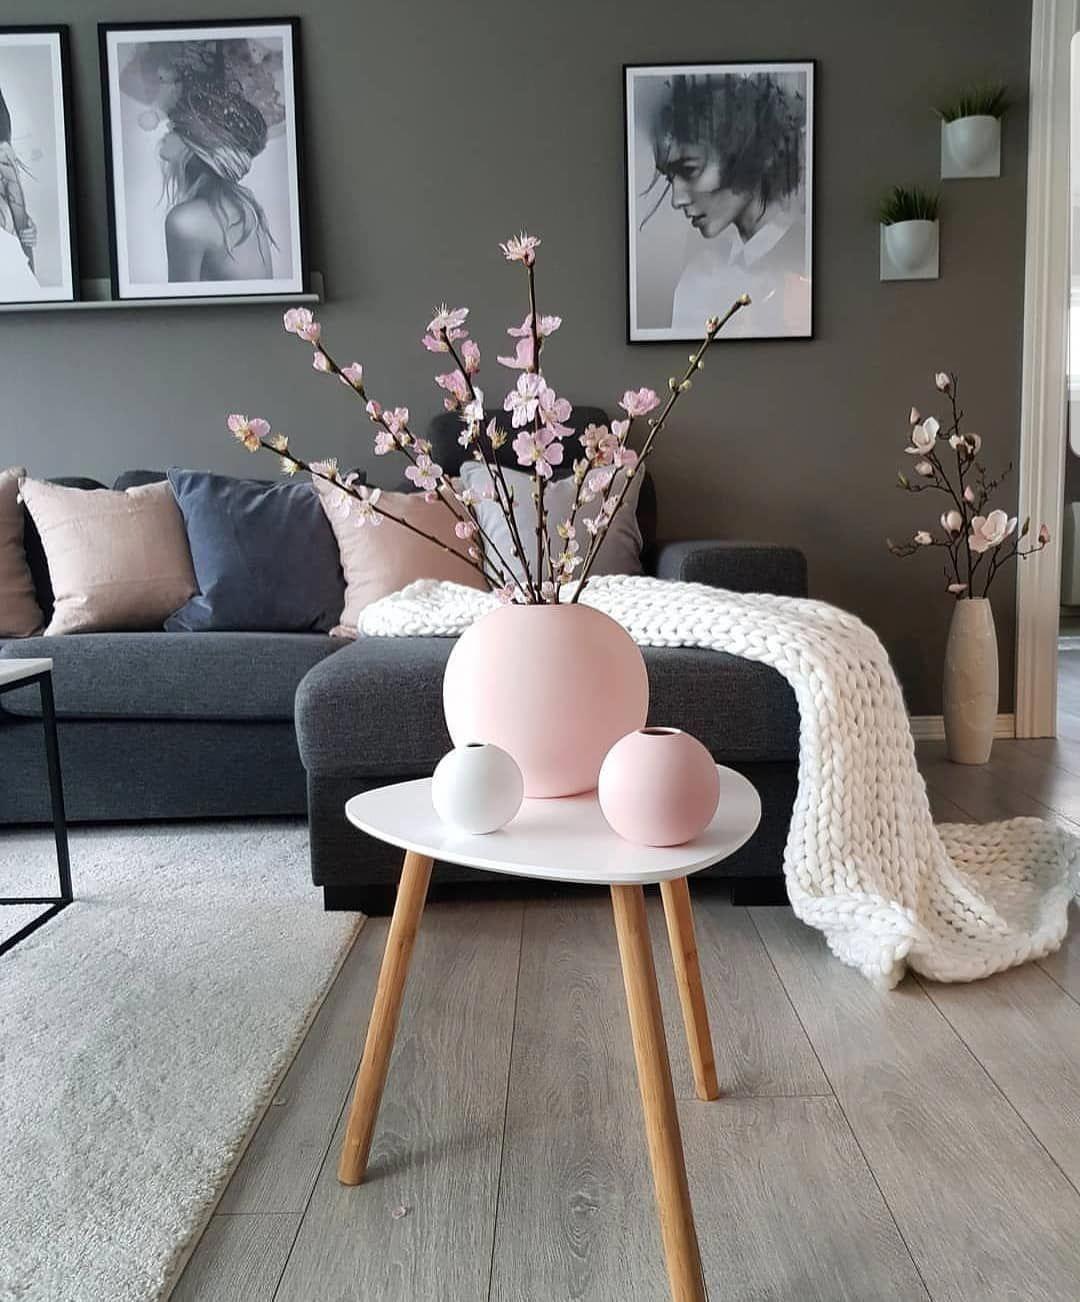 Home Design On Instagram Credit Kristingronas Inspire Me Home Decor Interiordesig Living Room Decor Modern White Home Decor Living Room Decor Apartment